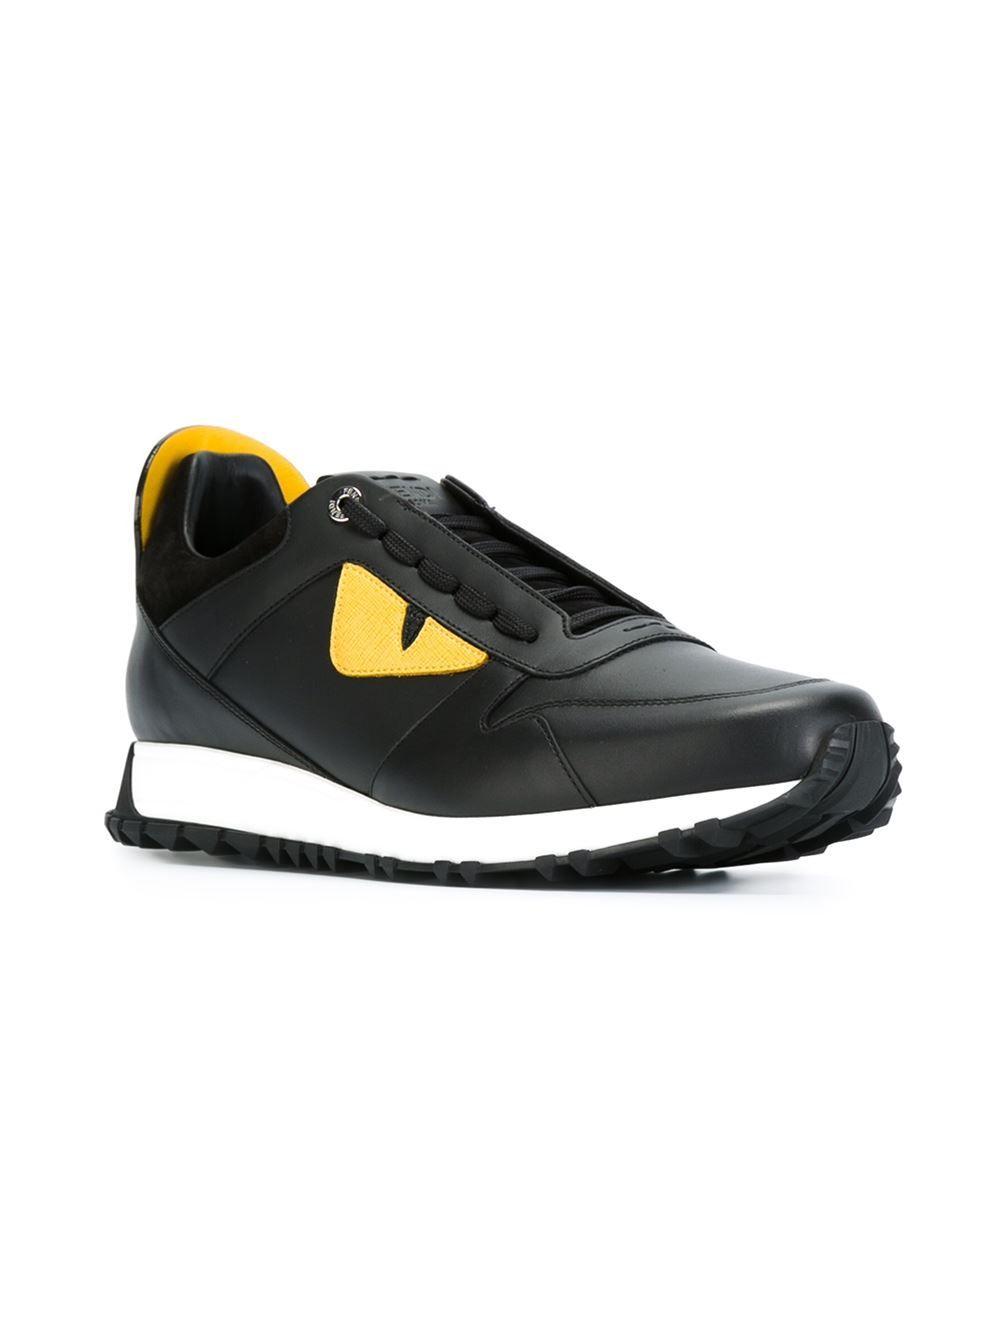 promo code 36a17 180ec  sneakers  bagbugs  fendi  monster  men  style  fashion www.jofre.eu